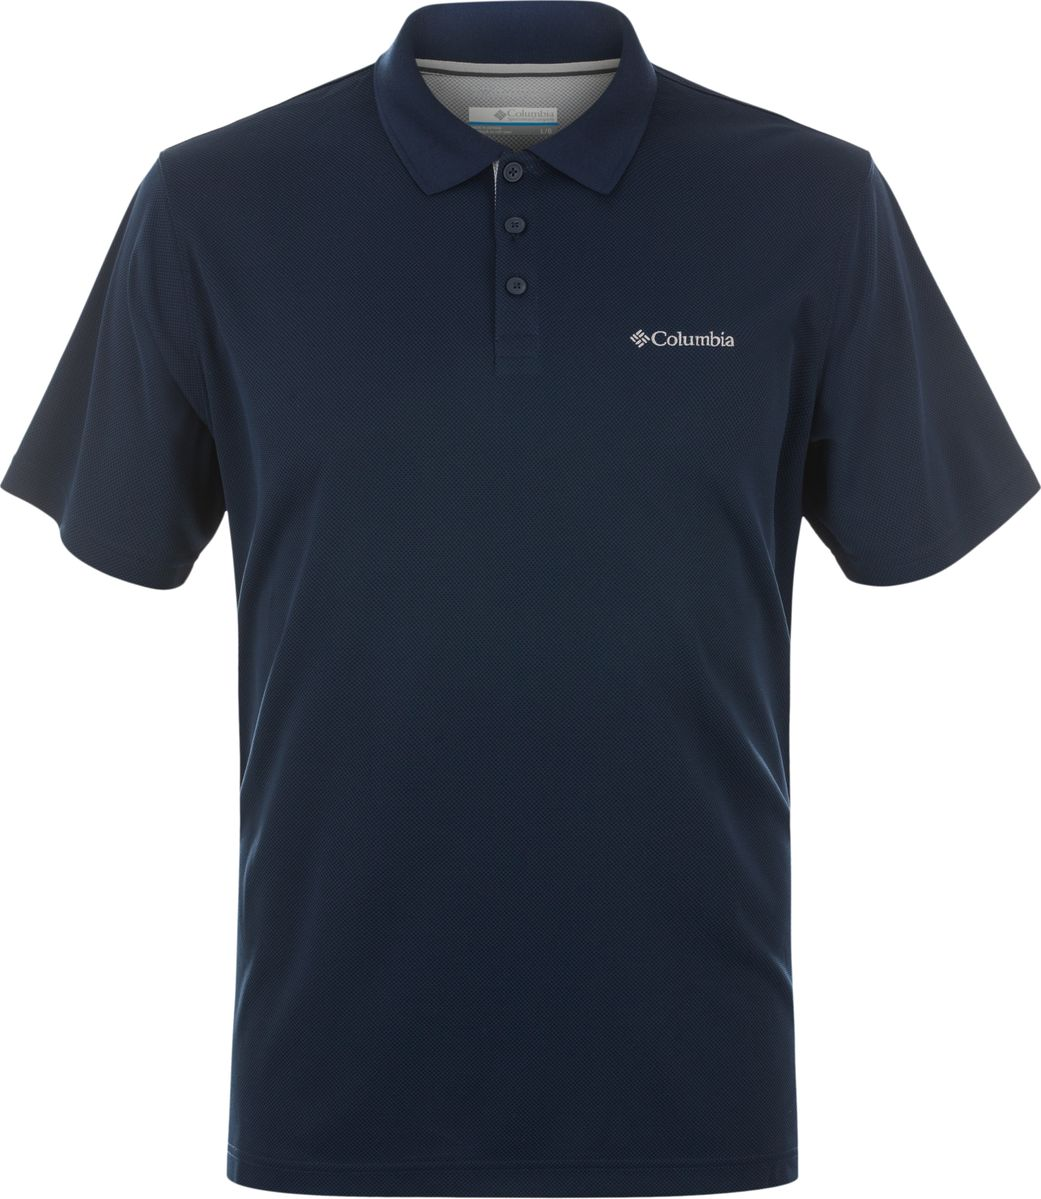 Поло мужское Columbia Utilizer Polo, цвет: темно-синий. 1772051-464. Размер S (44/46) футболка поло columbia